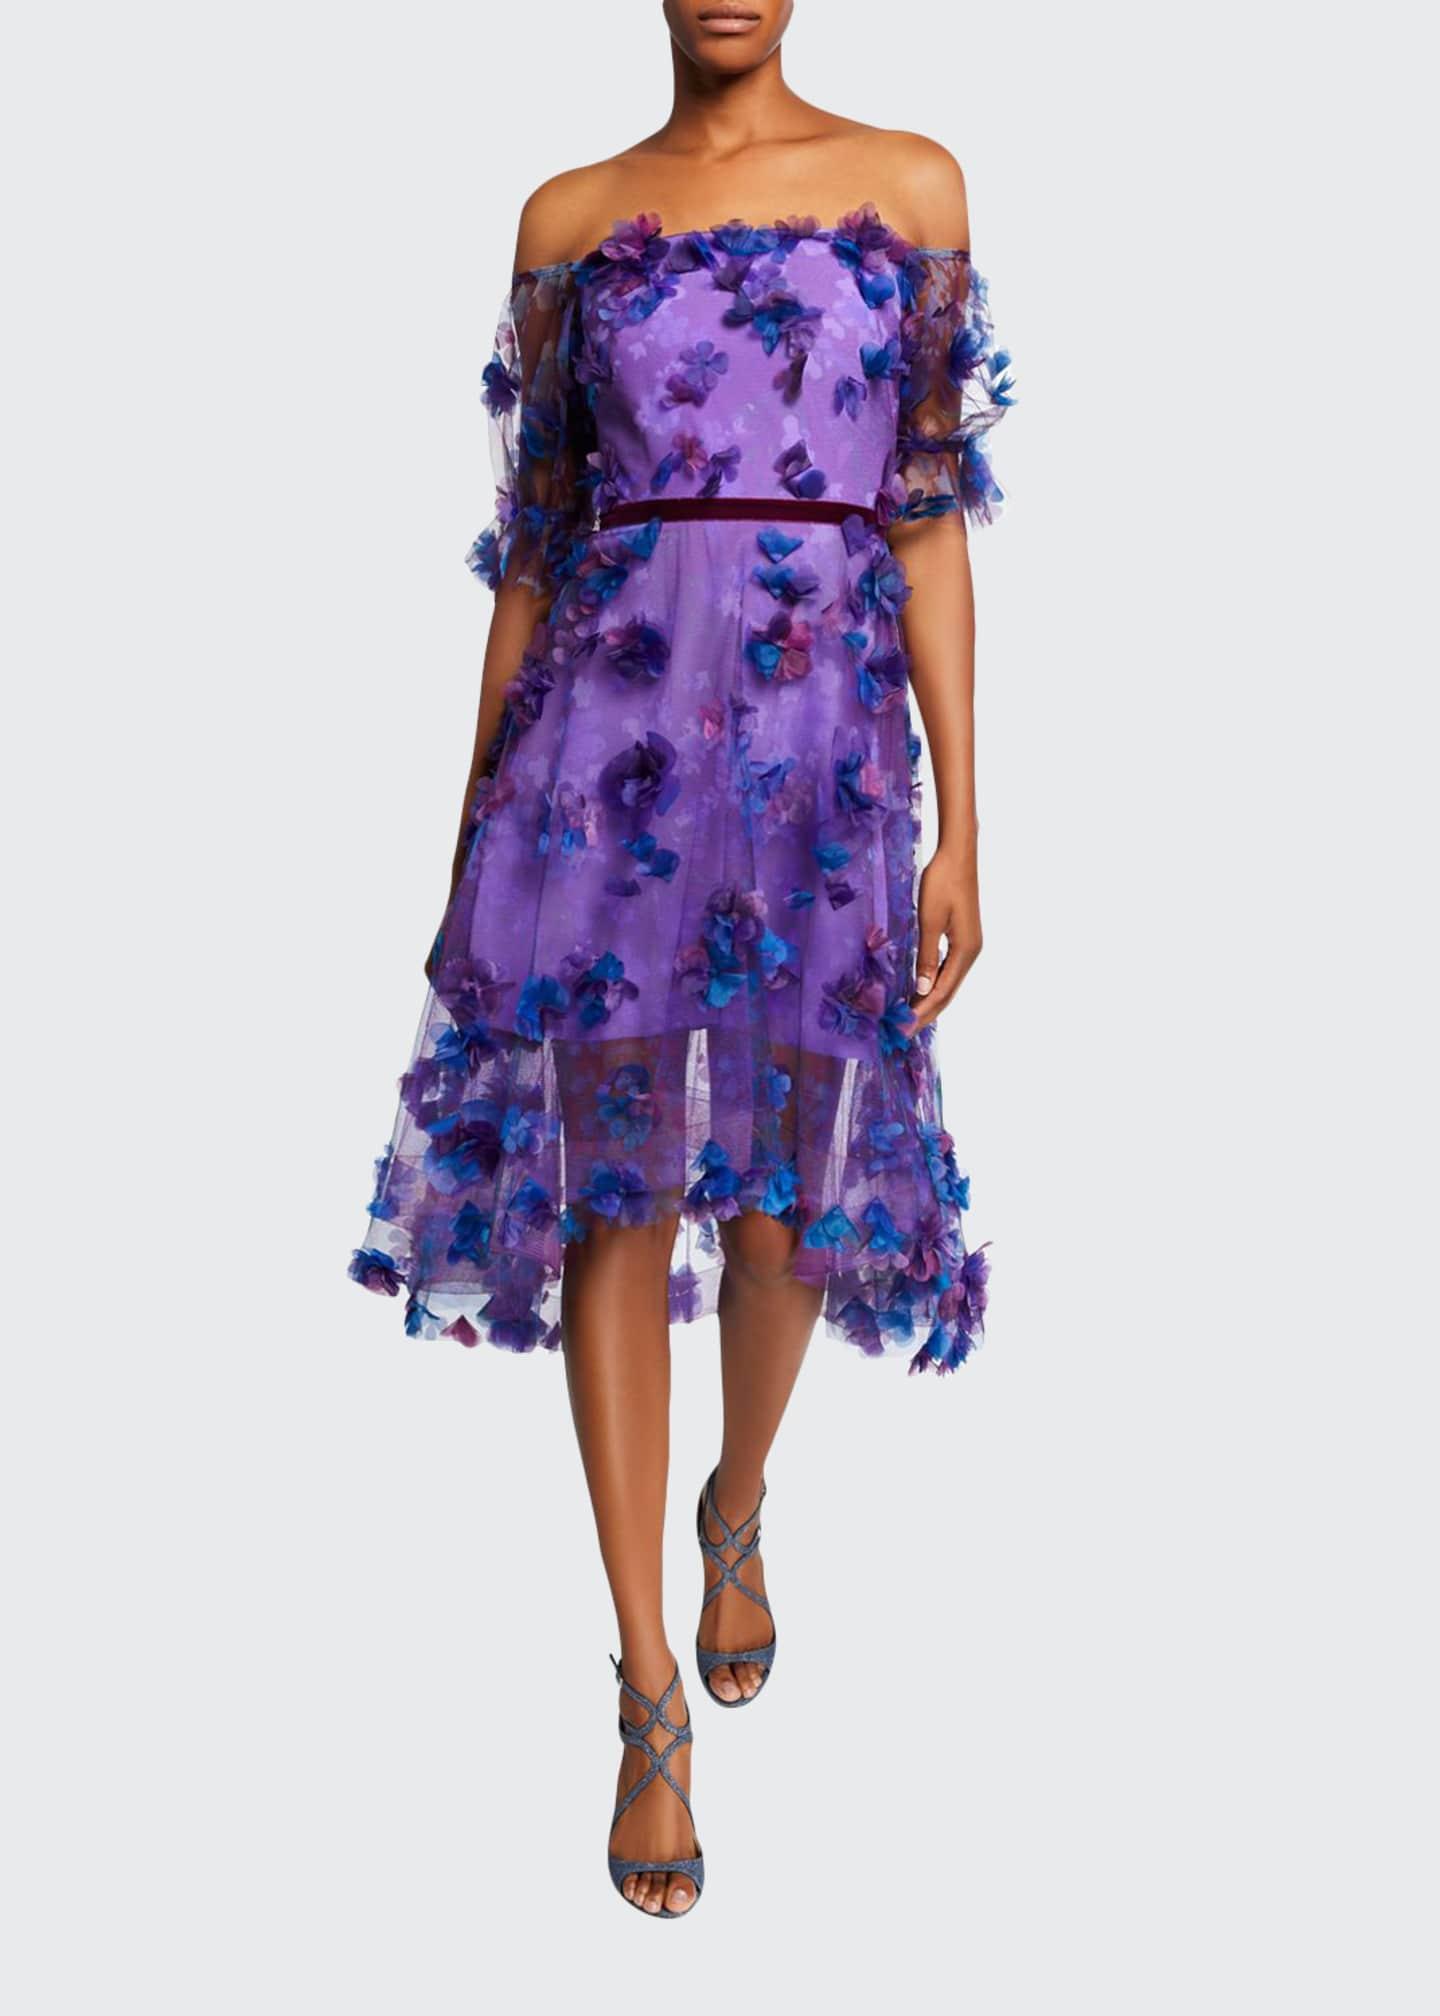 Marchesa Notte Off-the-Shoulder Blouson-Sleeve Tulle Dress w/ 3D